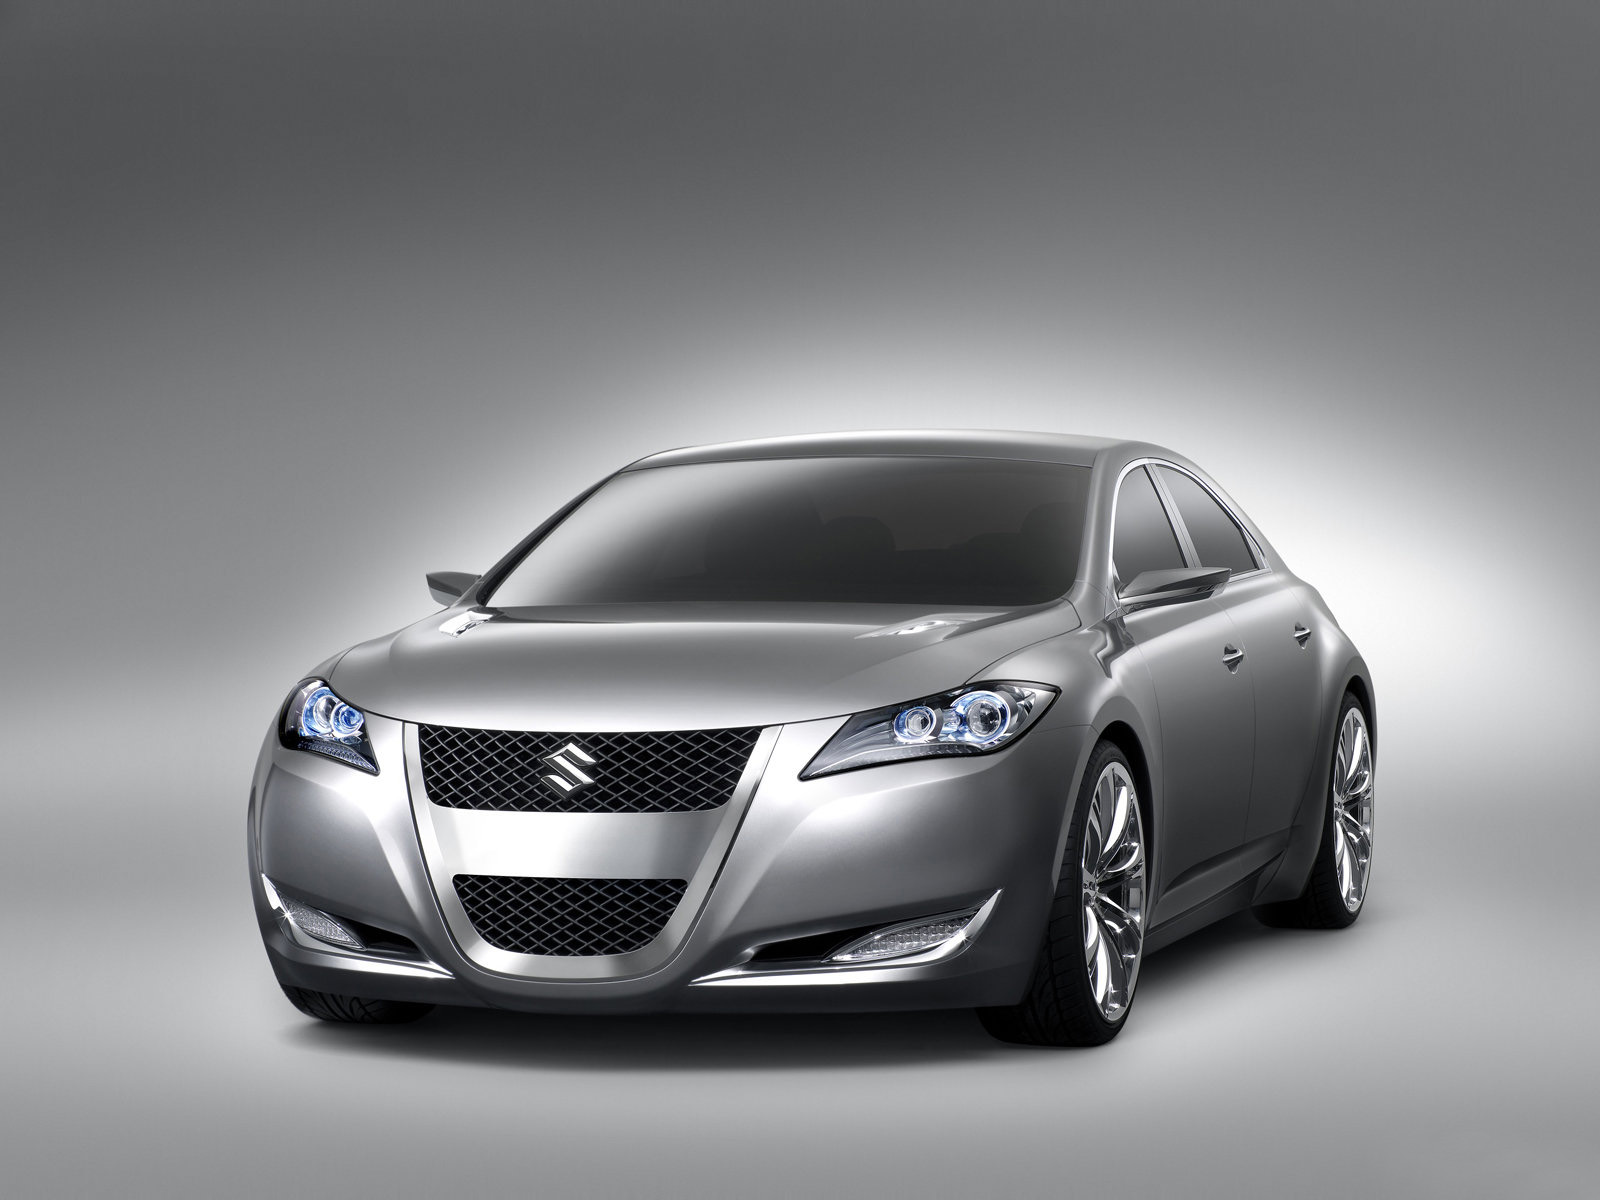 Achtergronden bureaublad Suzuki - Cars automobiel Auto auto's